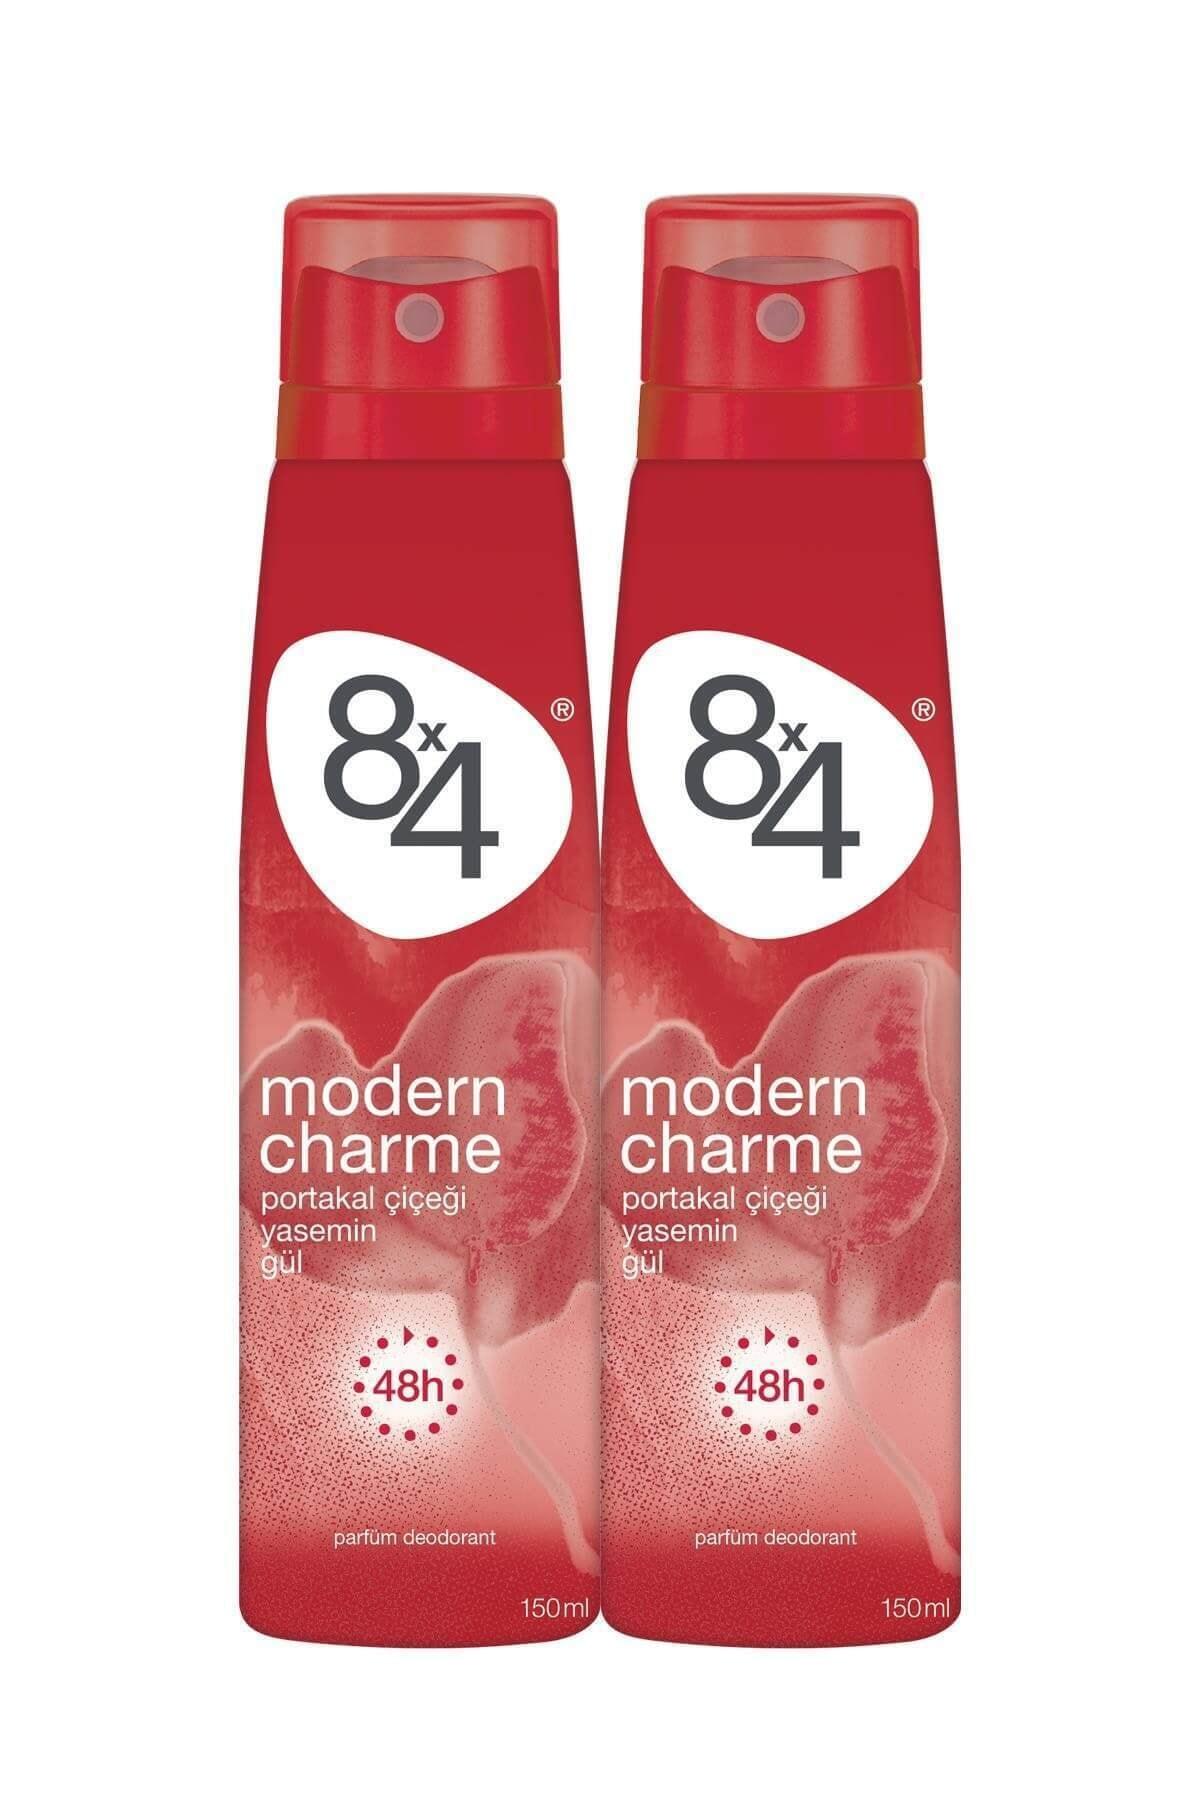 8x4 Modern Charme Kadın Deo Sprey 150 ml 2 Adet 1